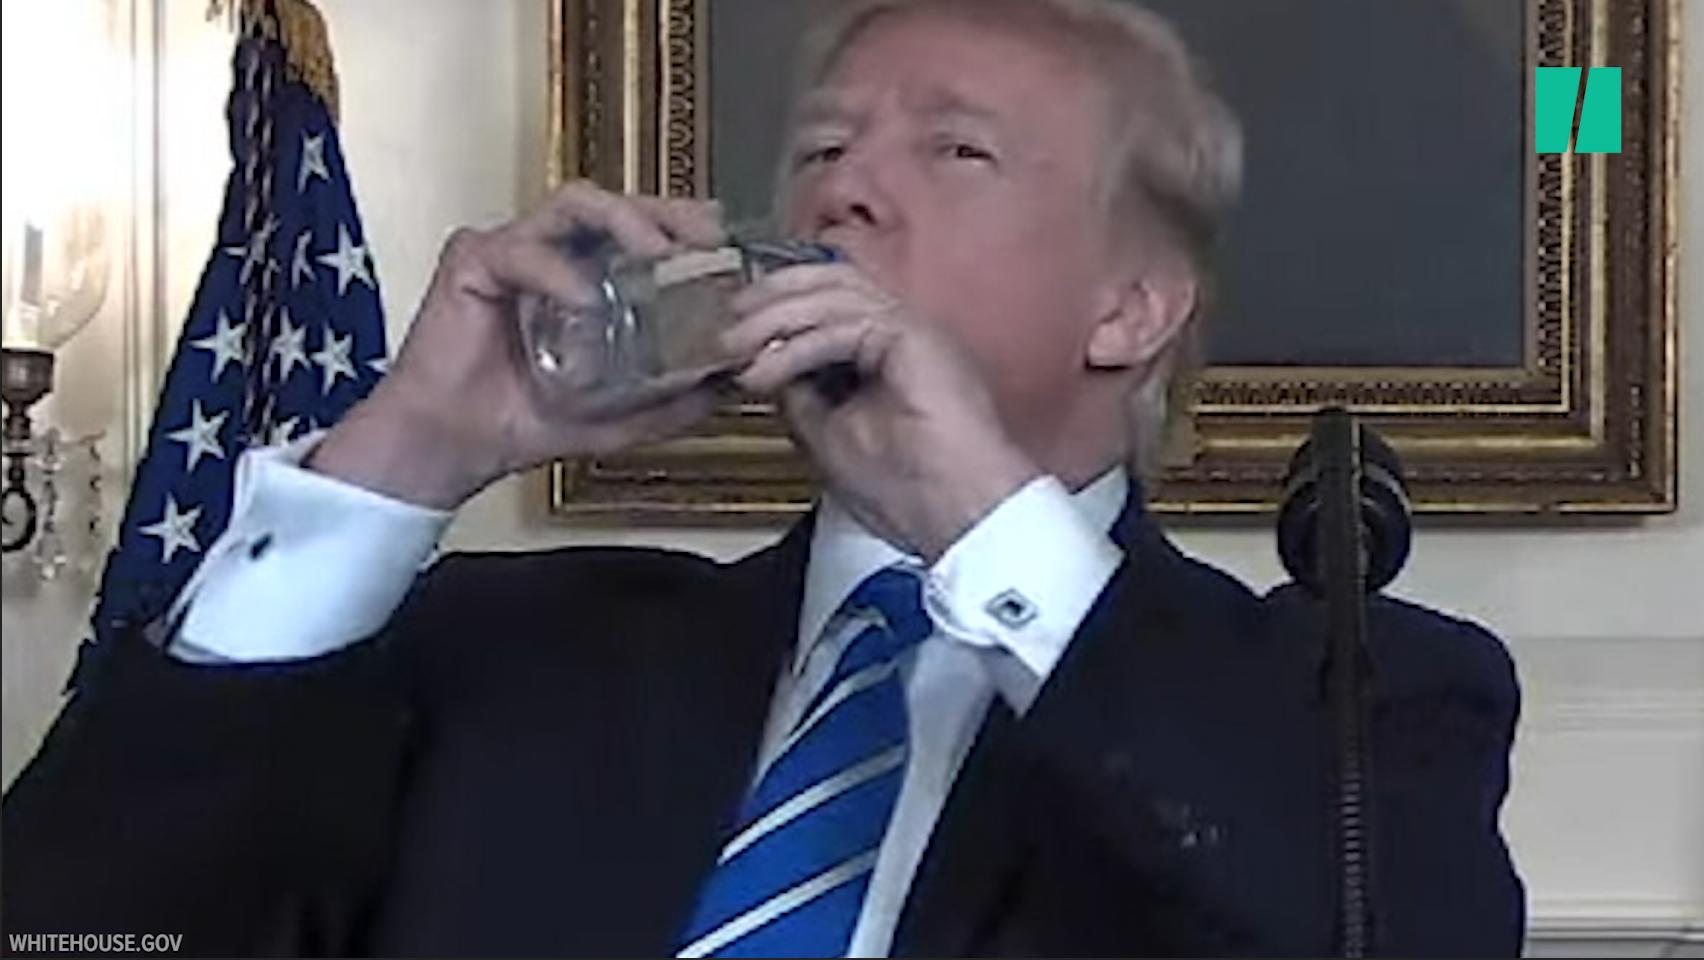 Trump Gets Thirsty